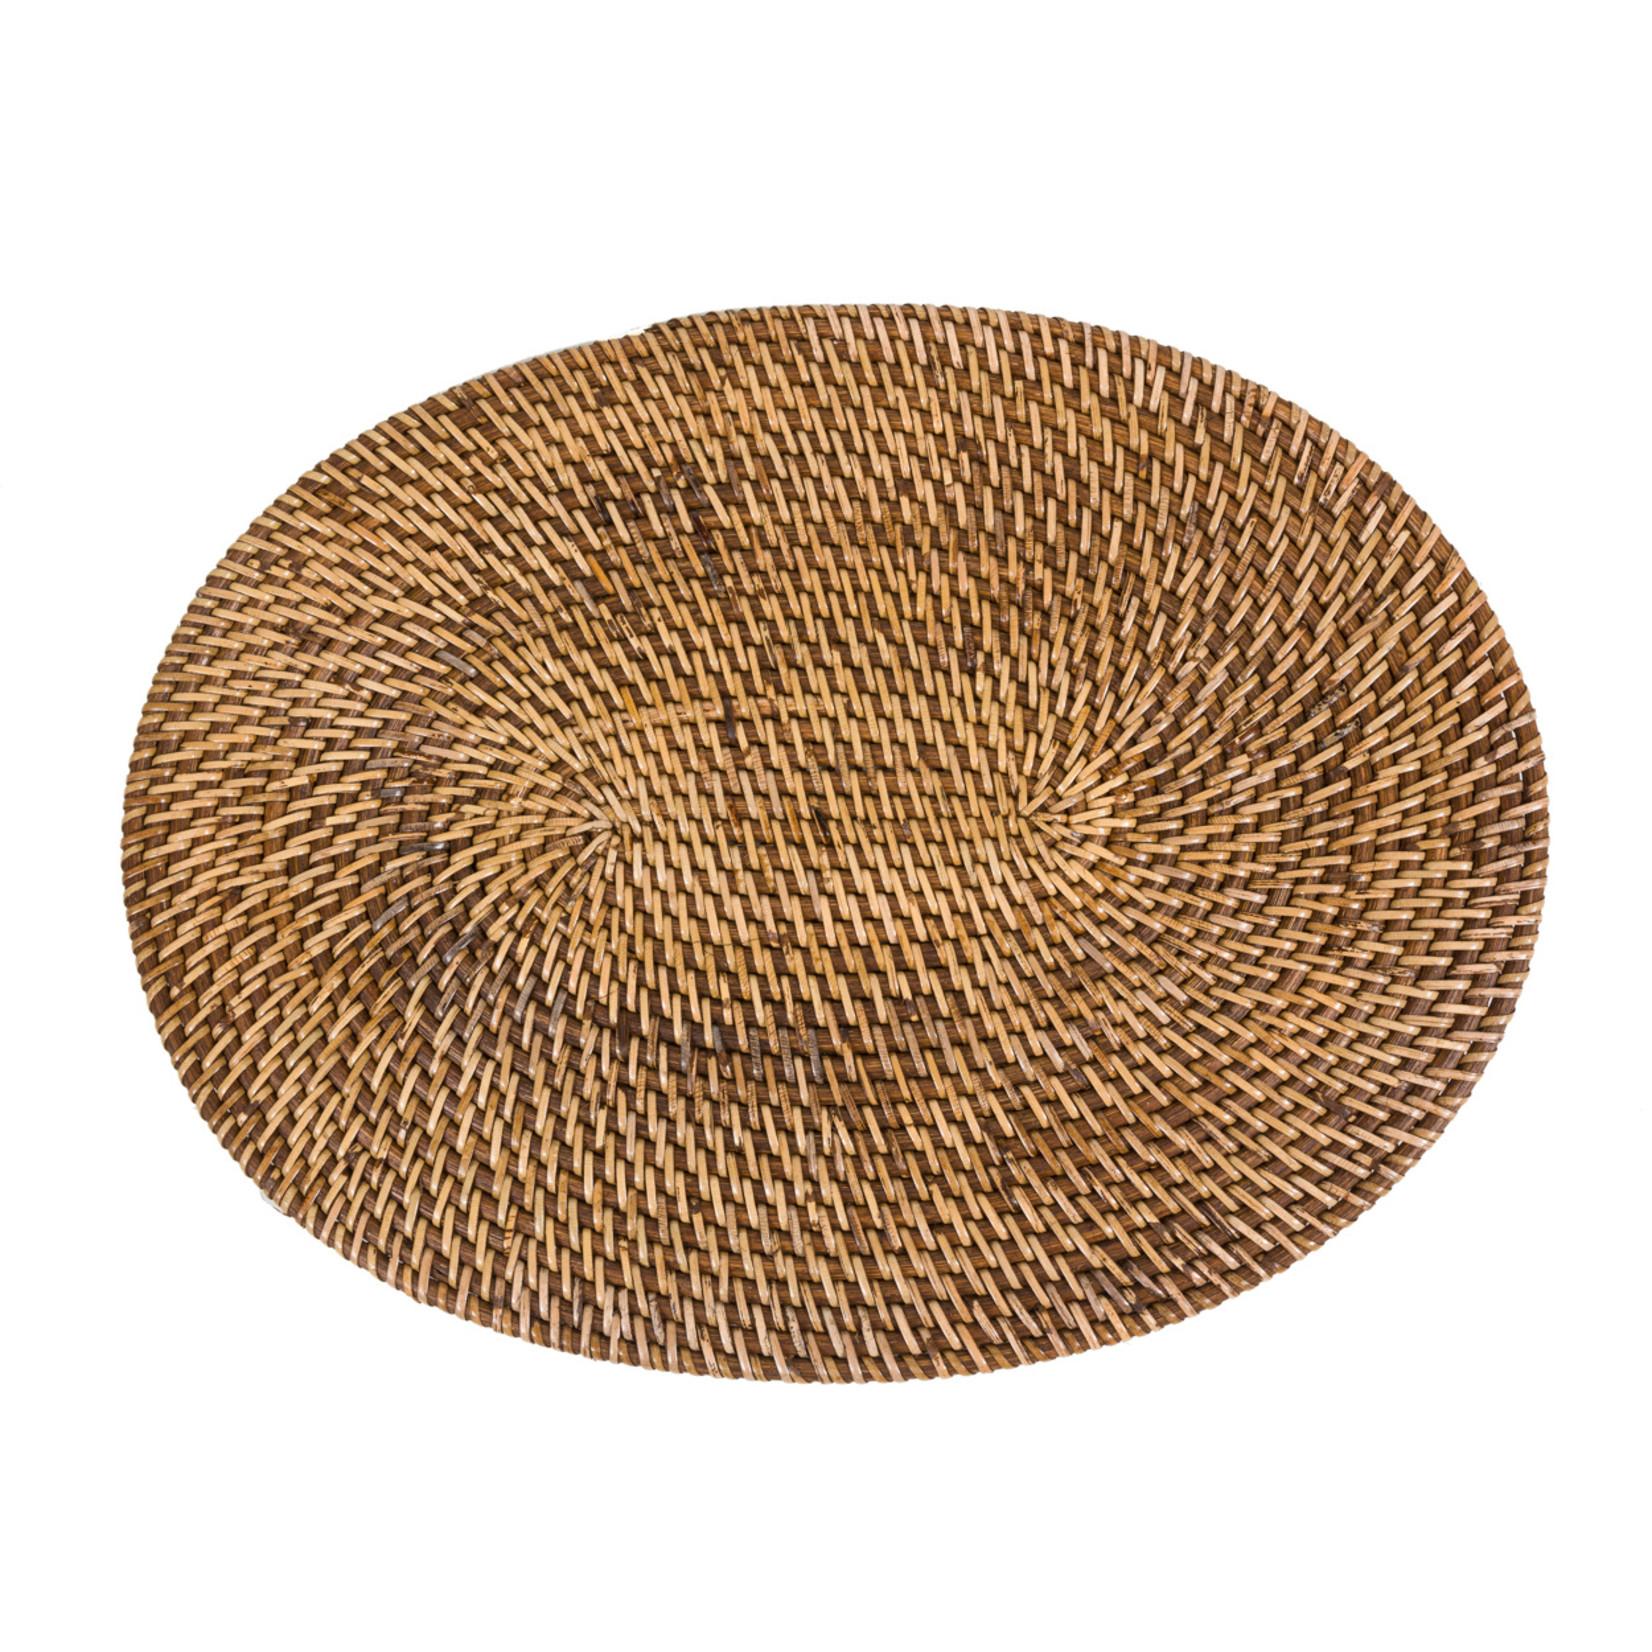 Bazar Bizar De Colonial Ovale Placemat - Naturel Bruin